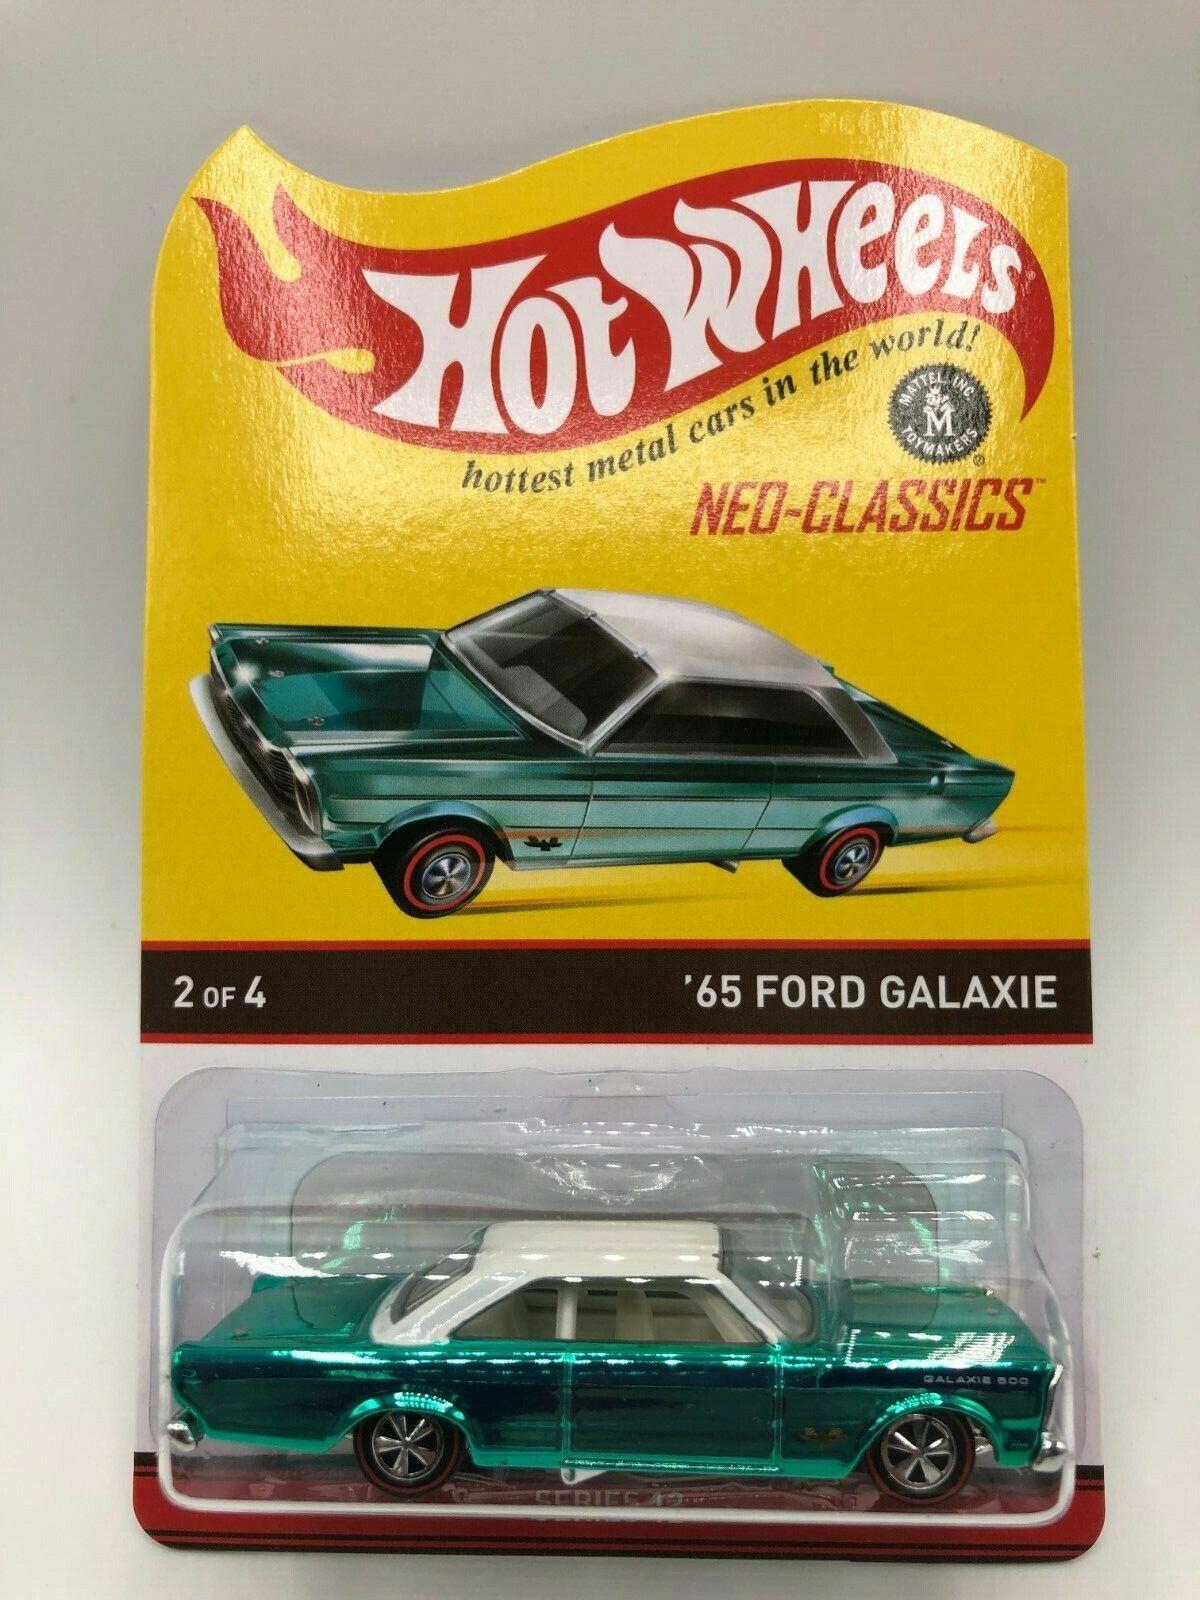 Hot Wheels RLC NEO-Classics Teal Grün 65 Ford Galaxie MIBP Shipped In Protector